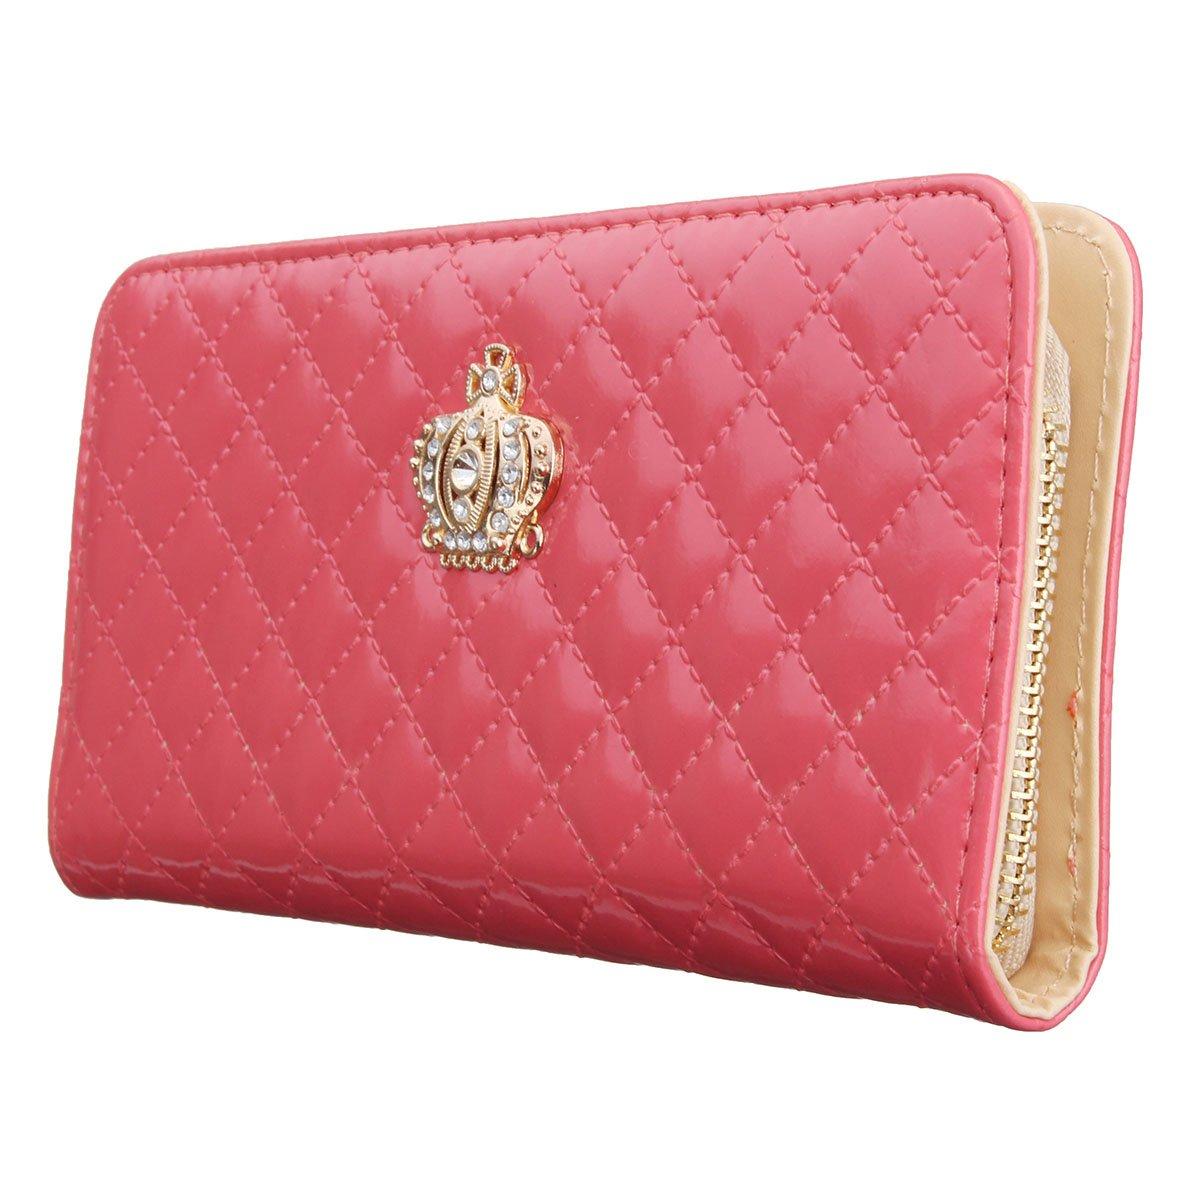 OURBAG Women Clutch Wallet $5.